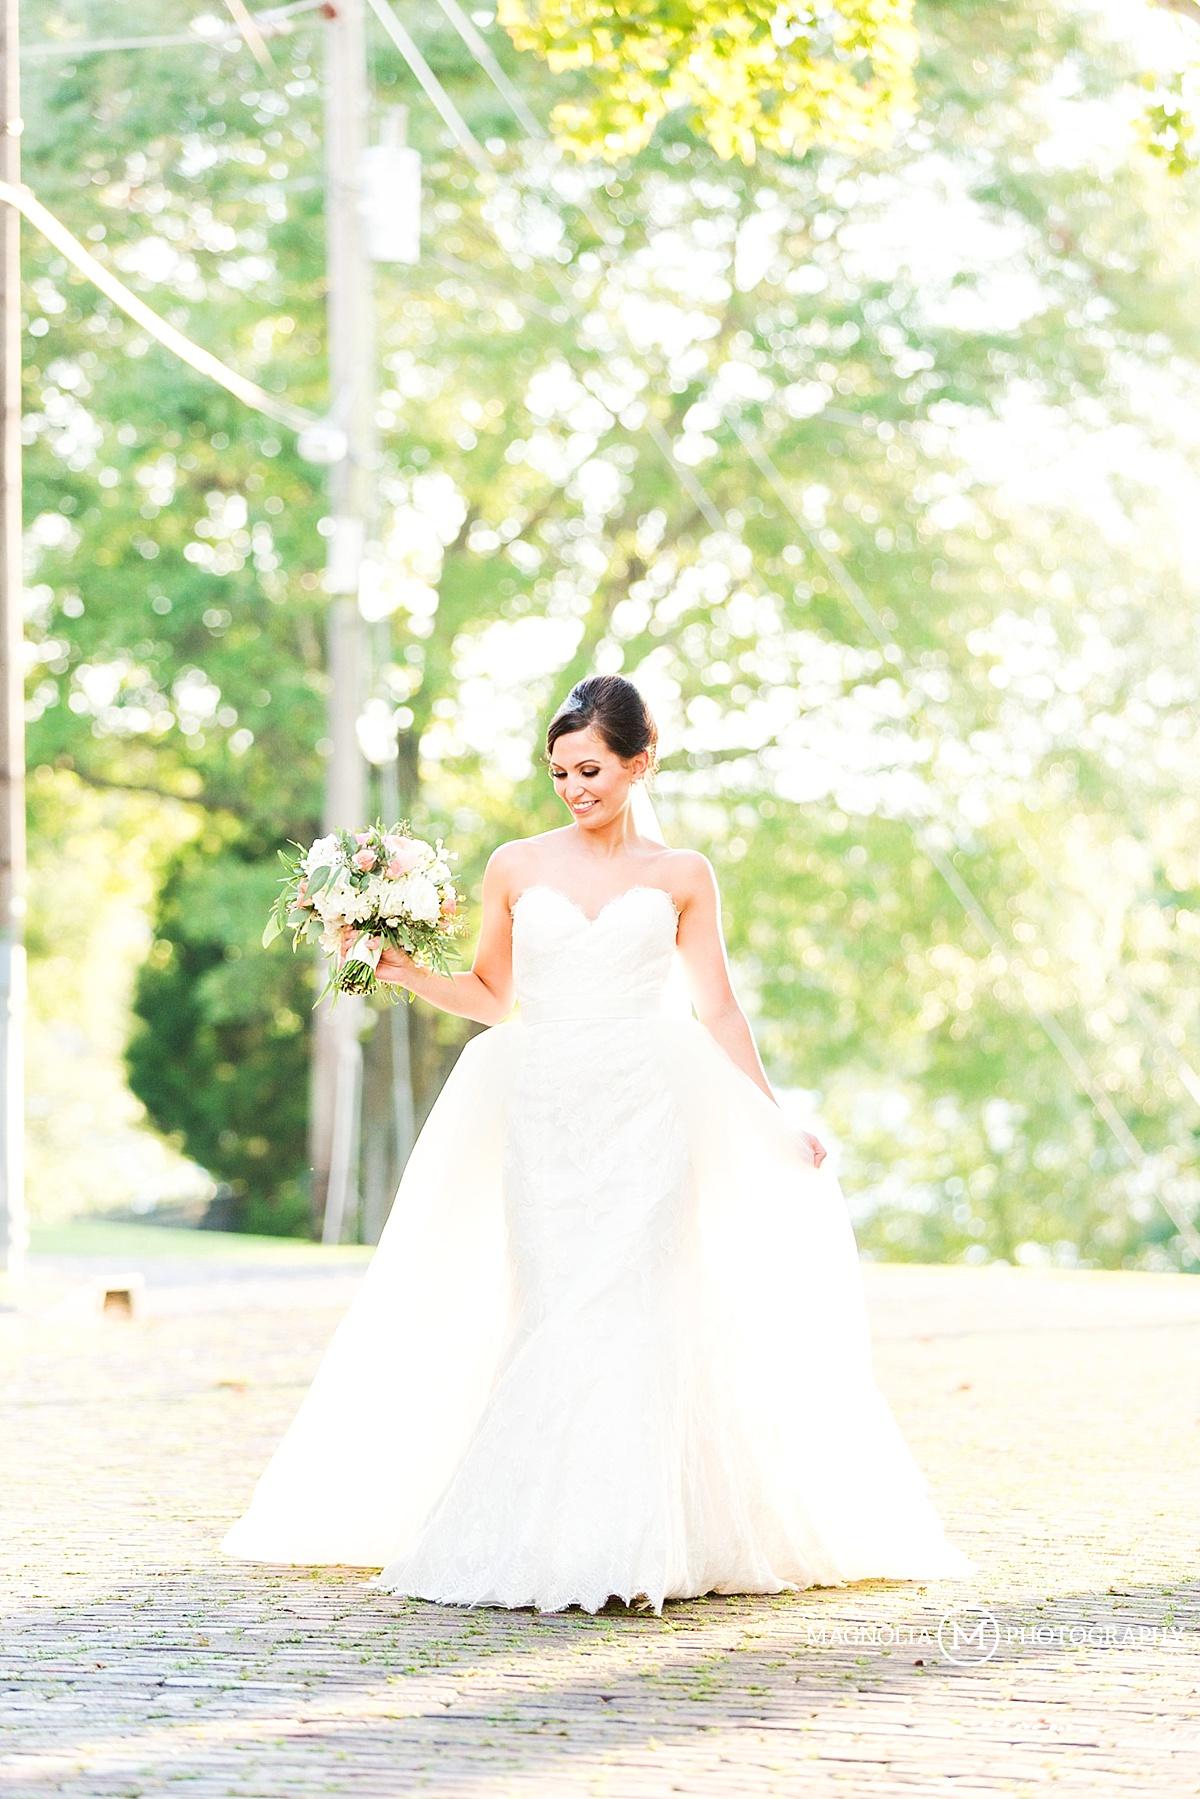 weddings at brooklyn arts center-56-1